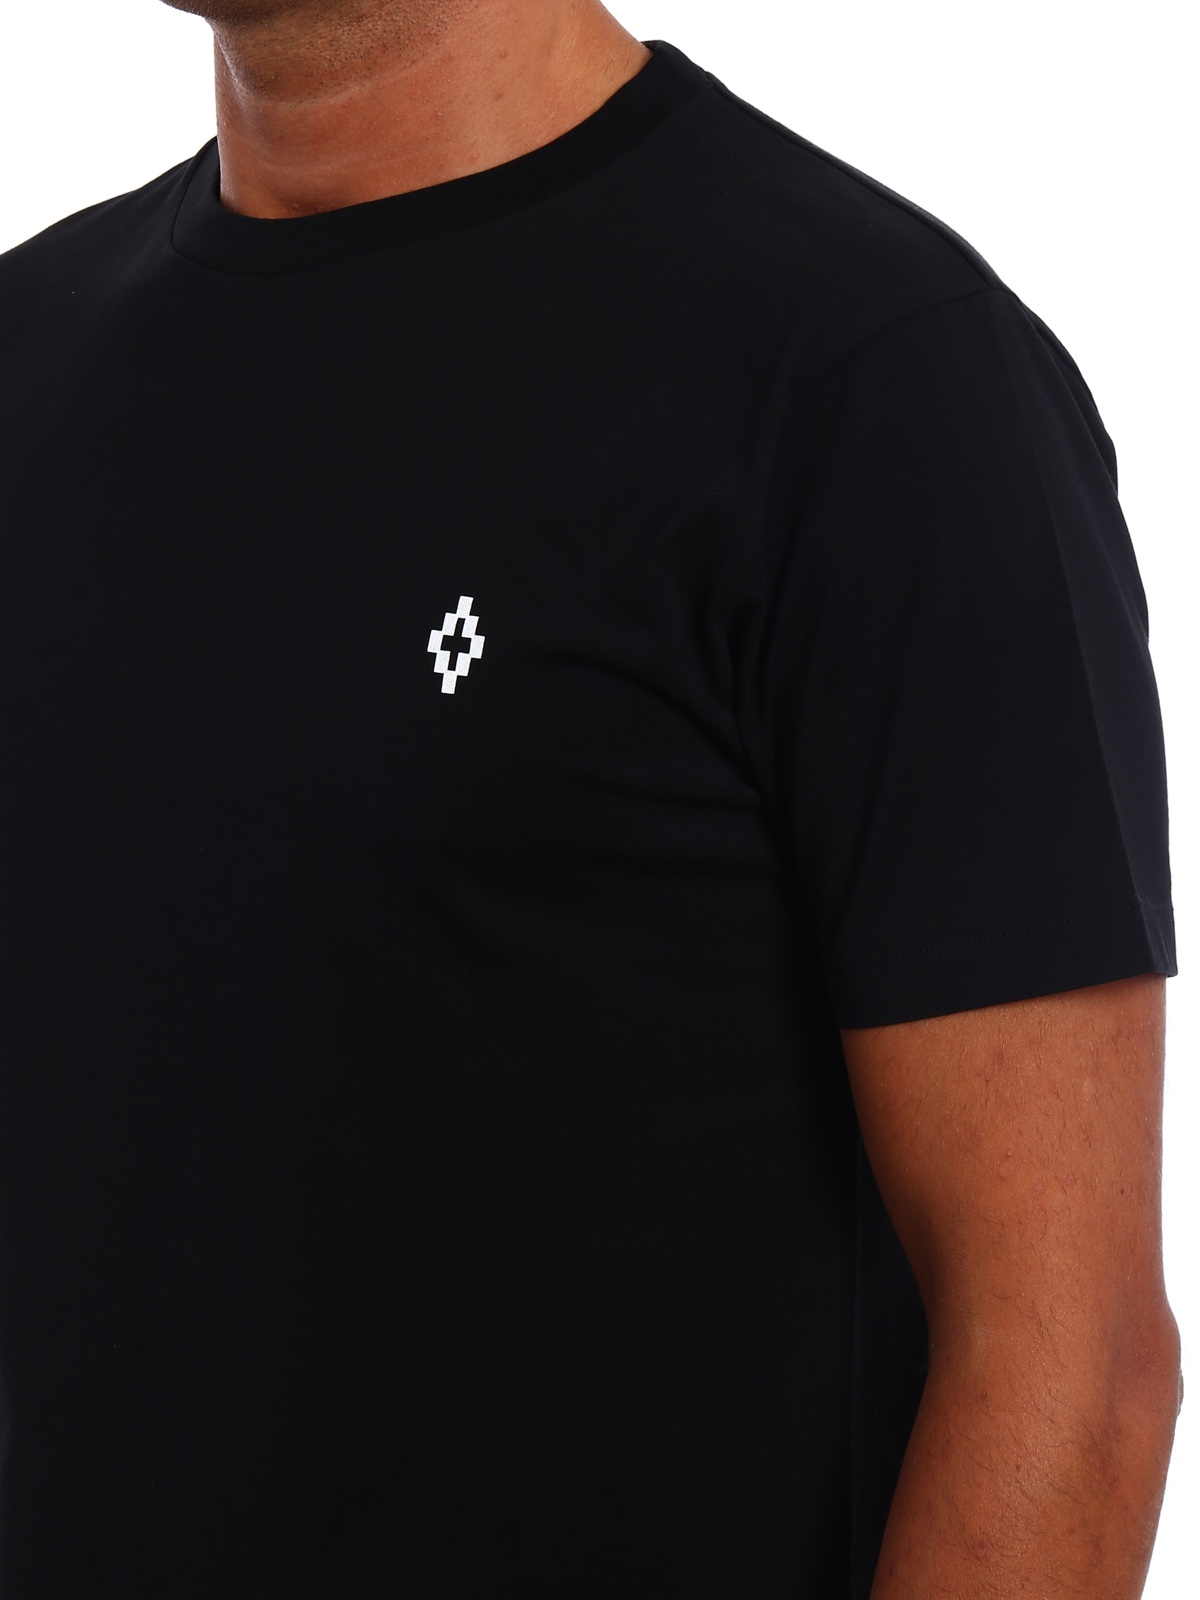 Marcelo Burton black T-shirt black